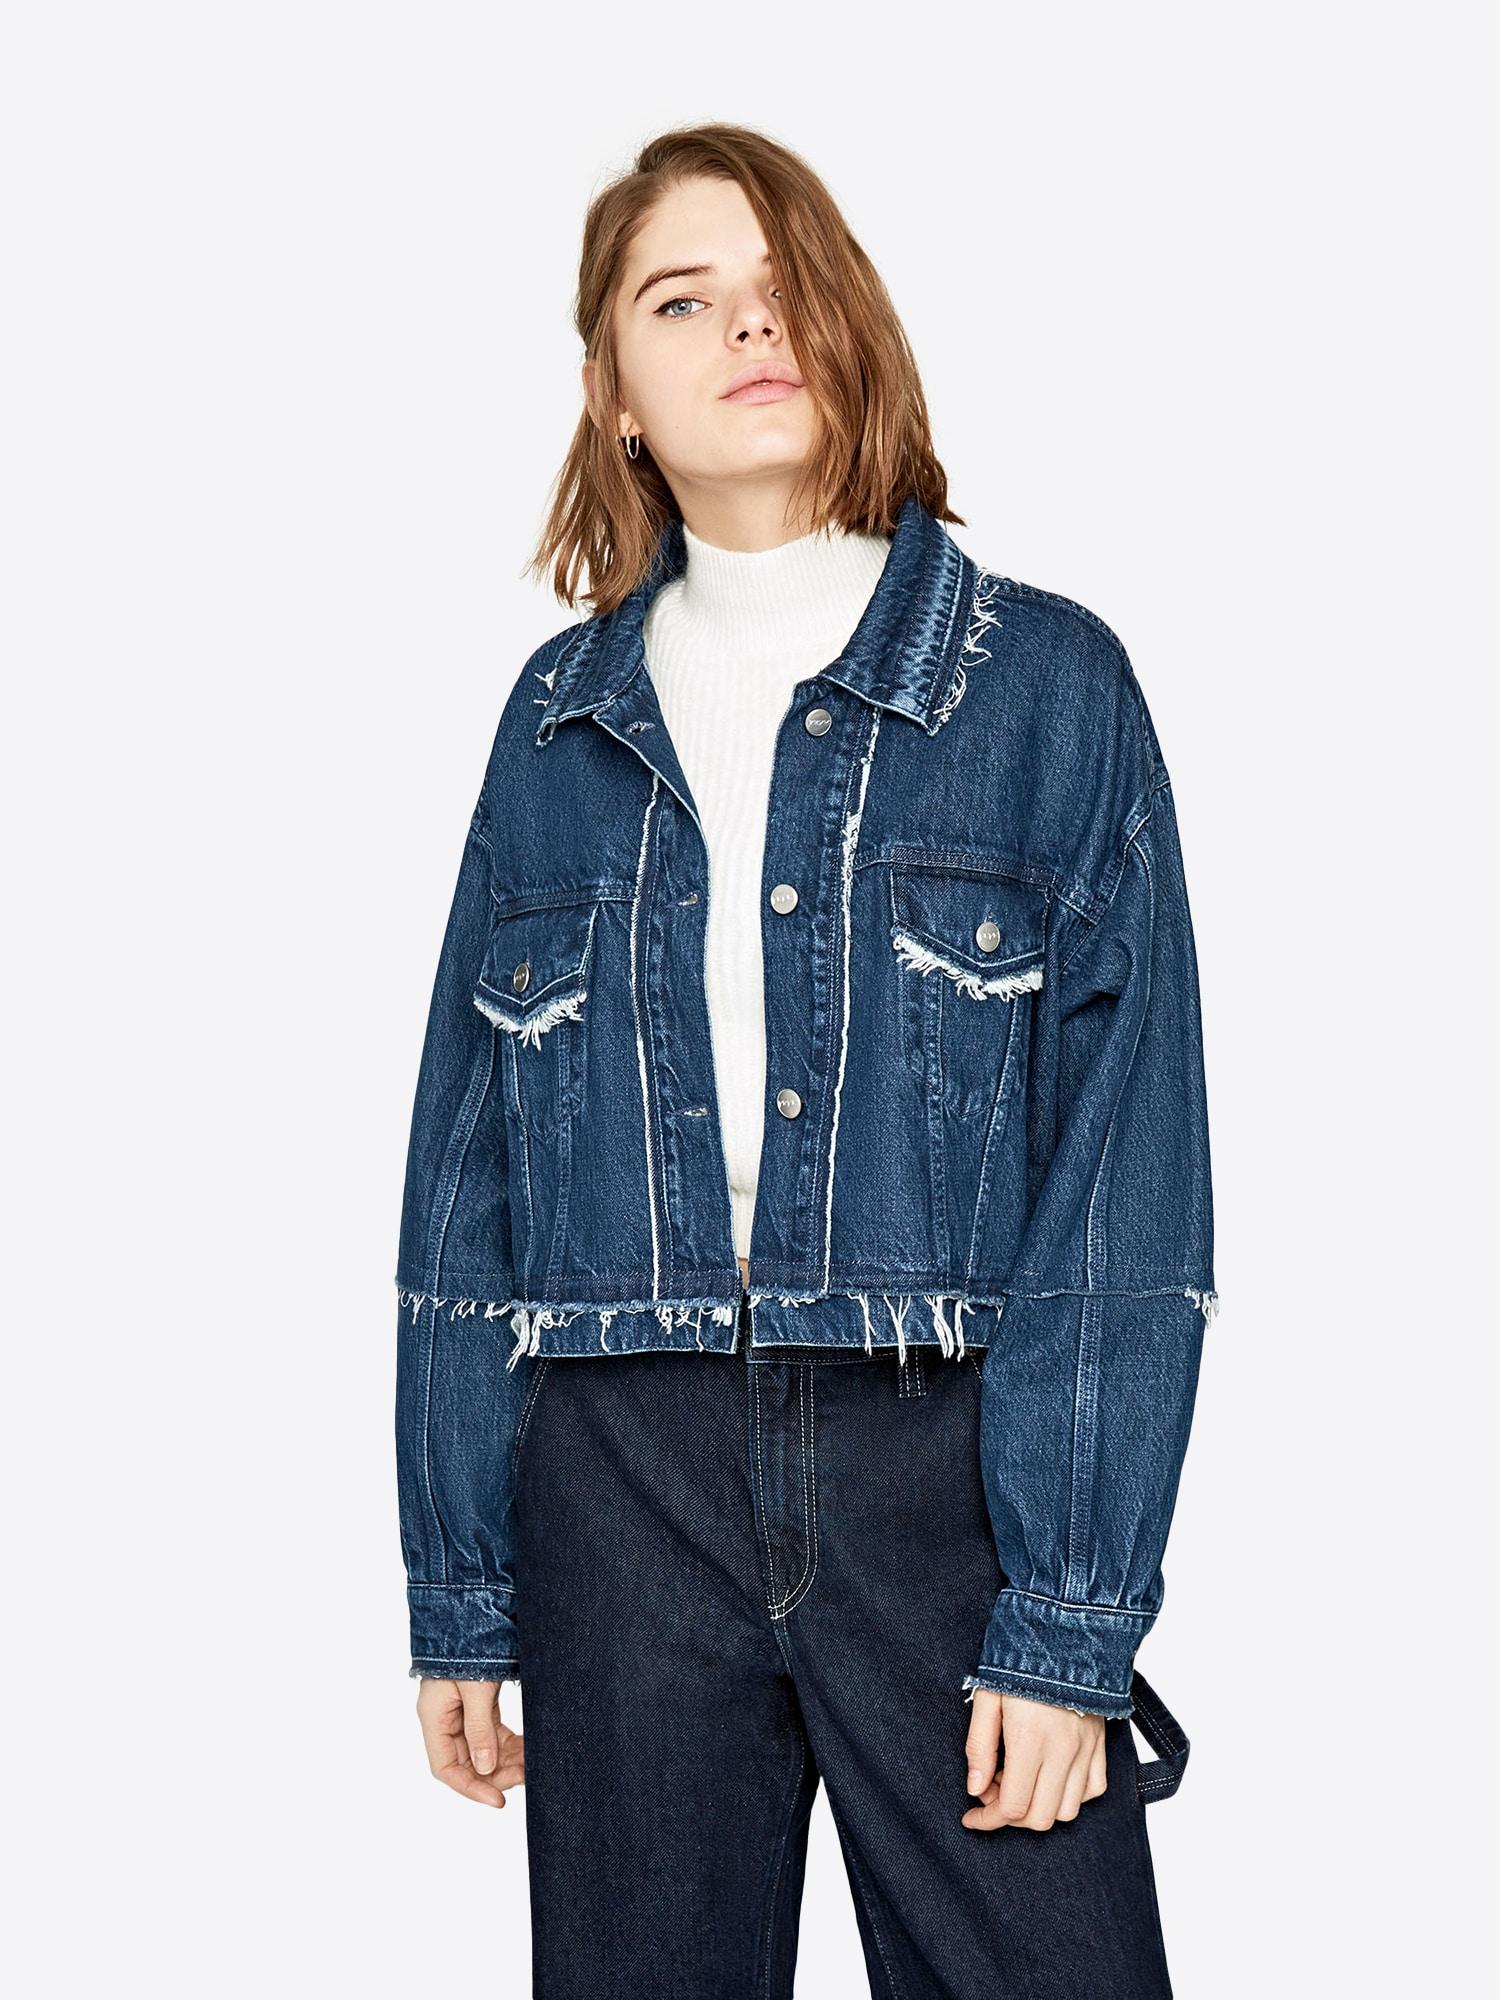 pepe jeans - Jeansjacke 'RINA'   Dua Lipa  Collection